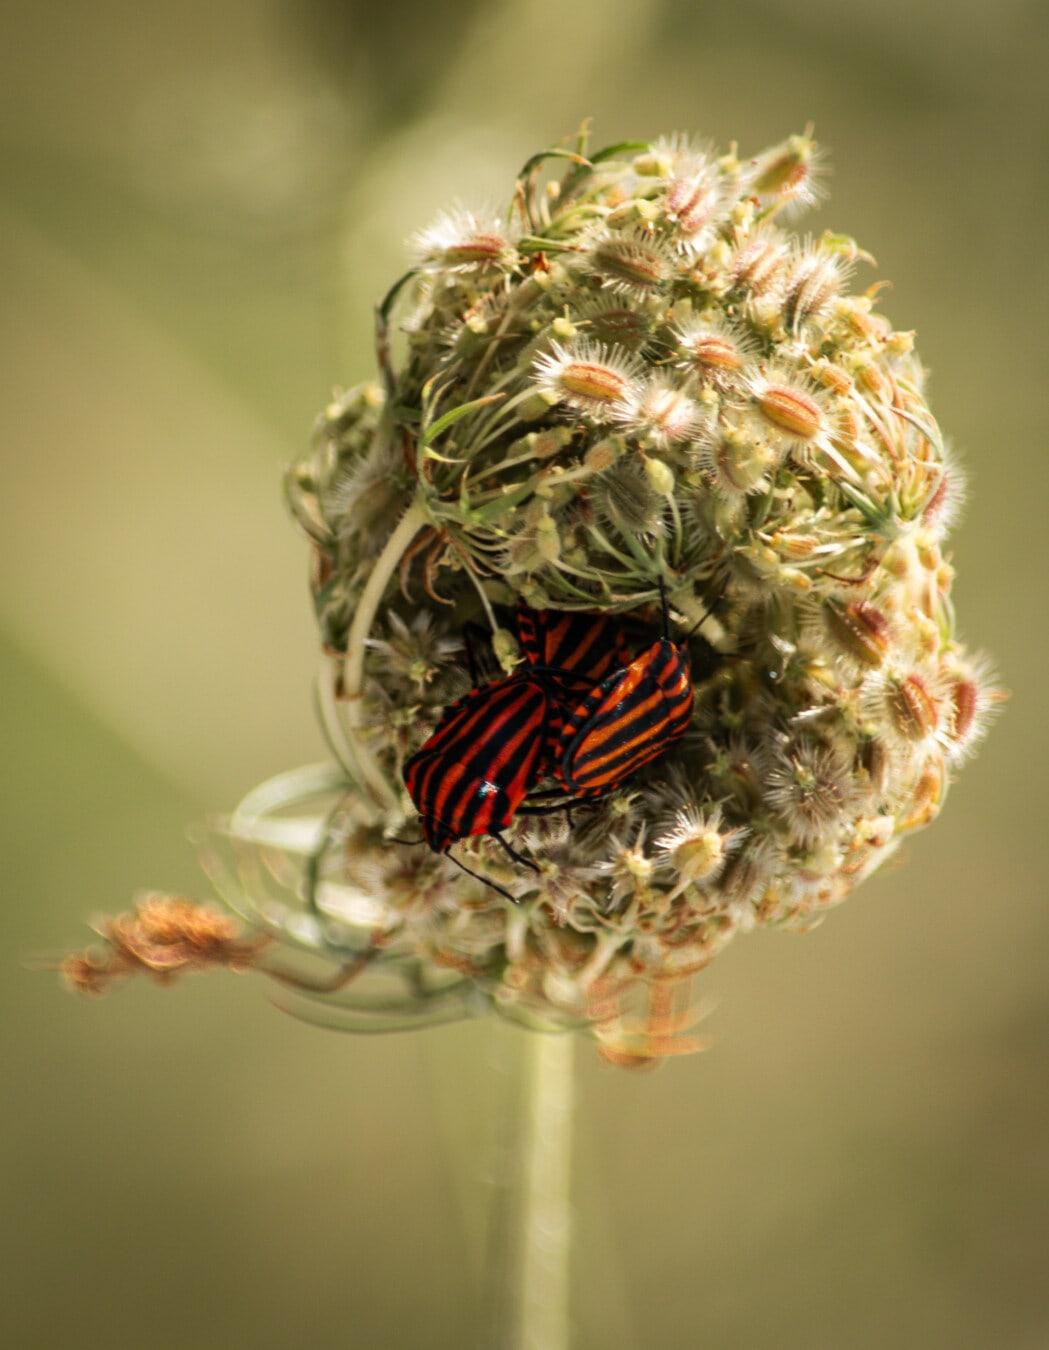 aus nächster Nähe, dunkelrot, Käfer, Tier, Insekt, Natur, Farbe, Blume, Flora, Biologie